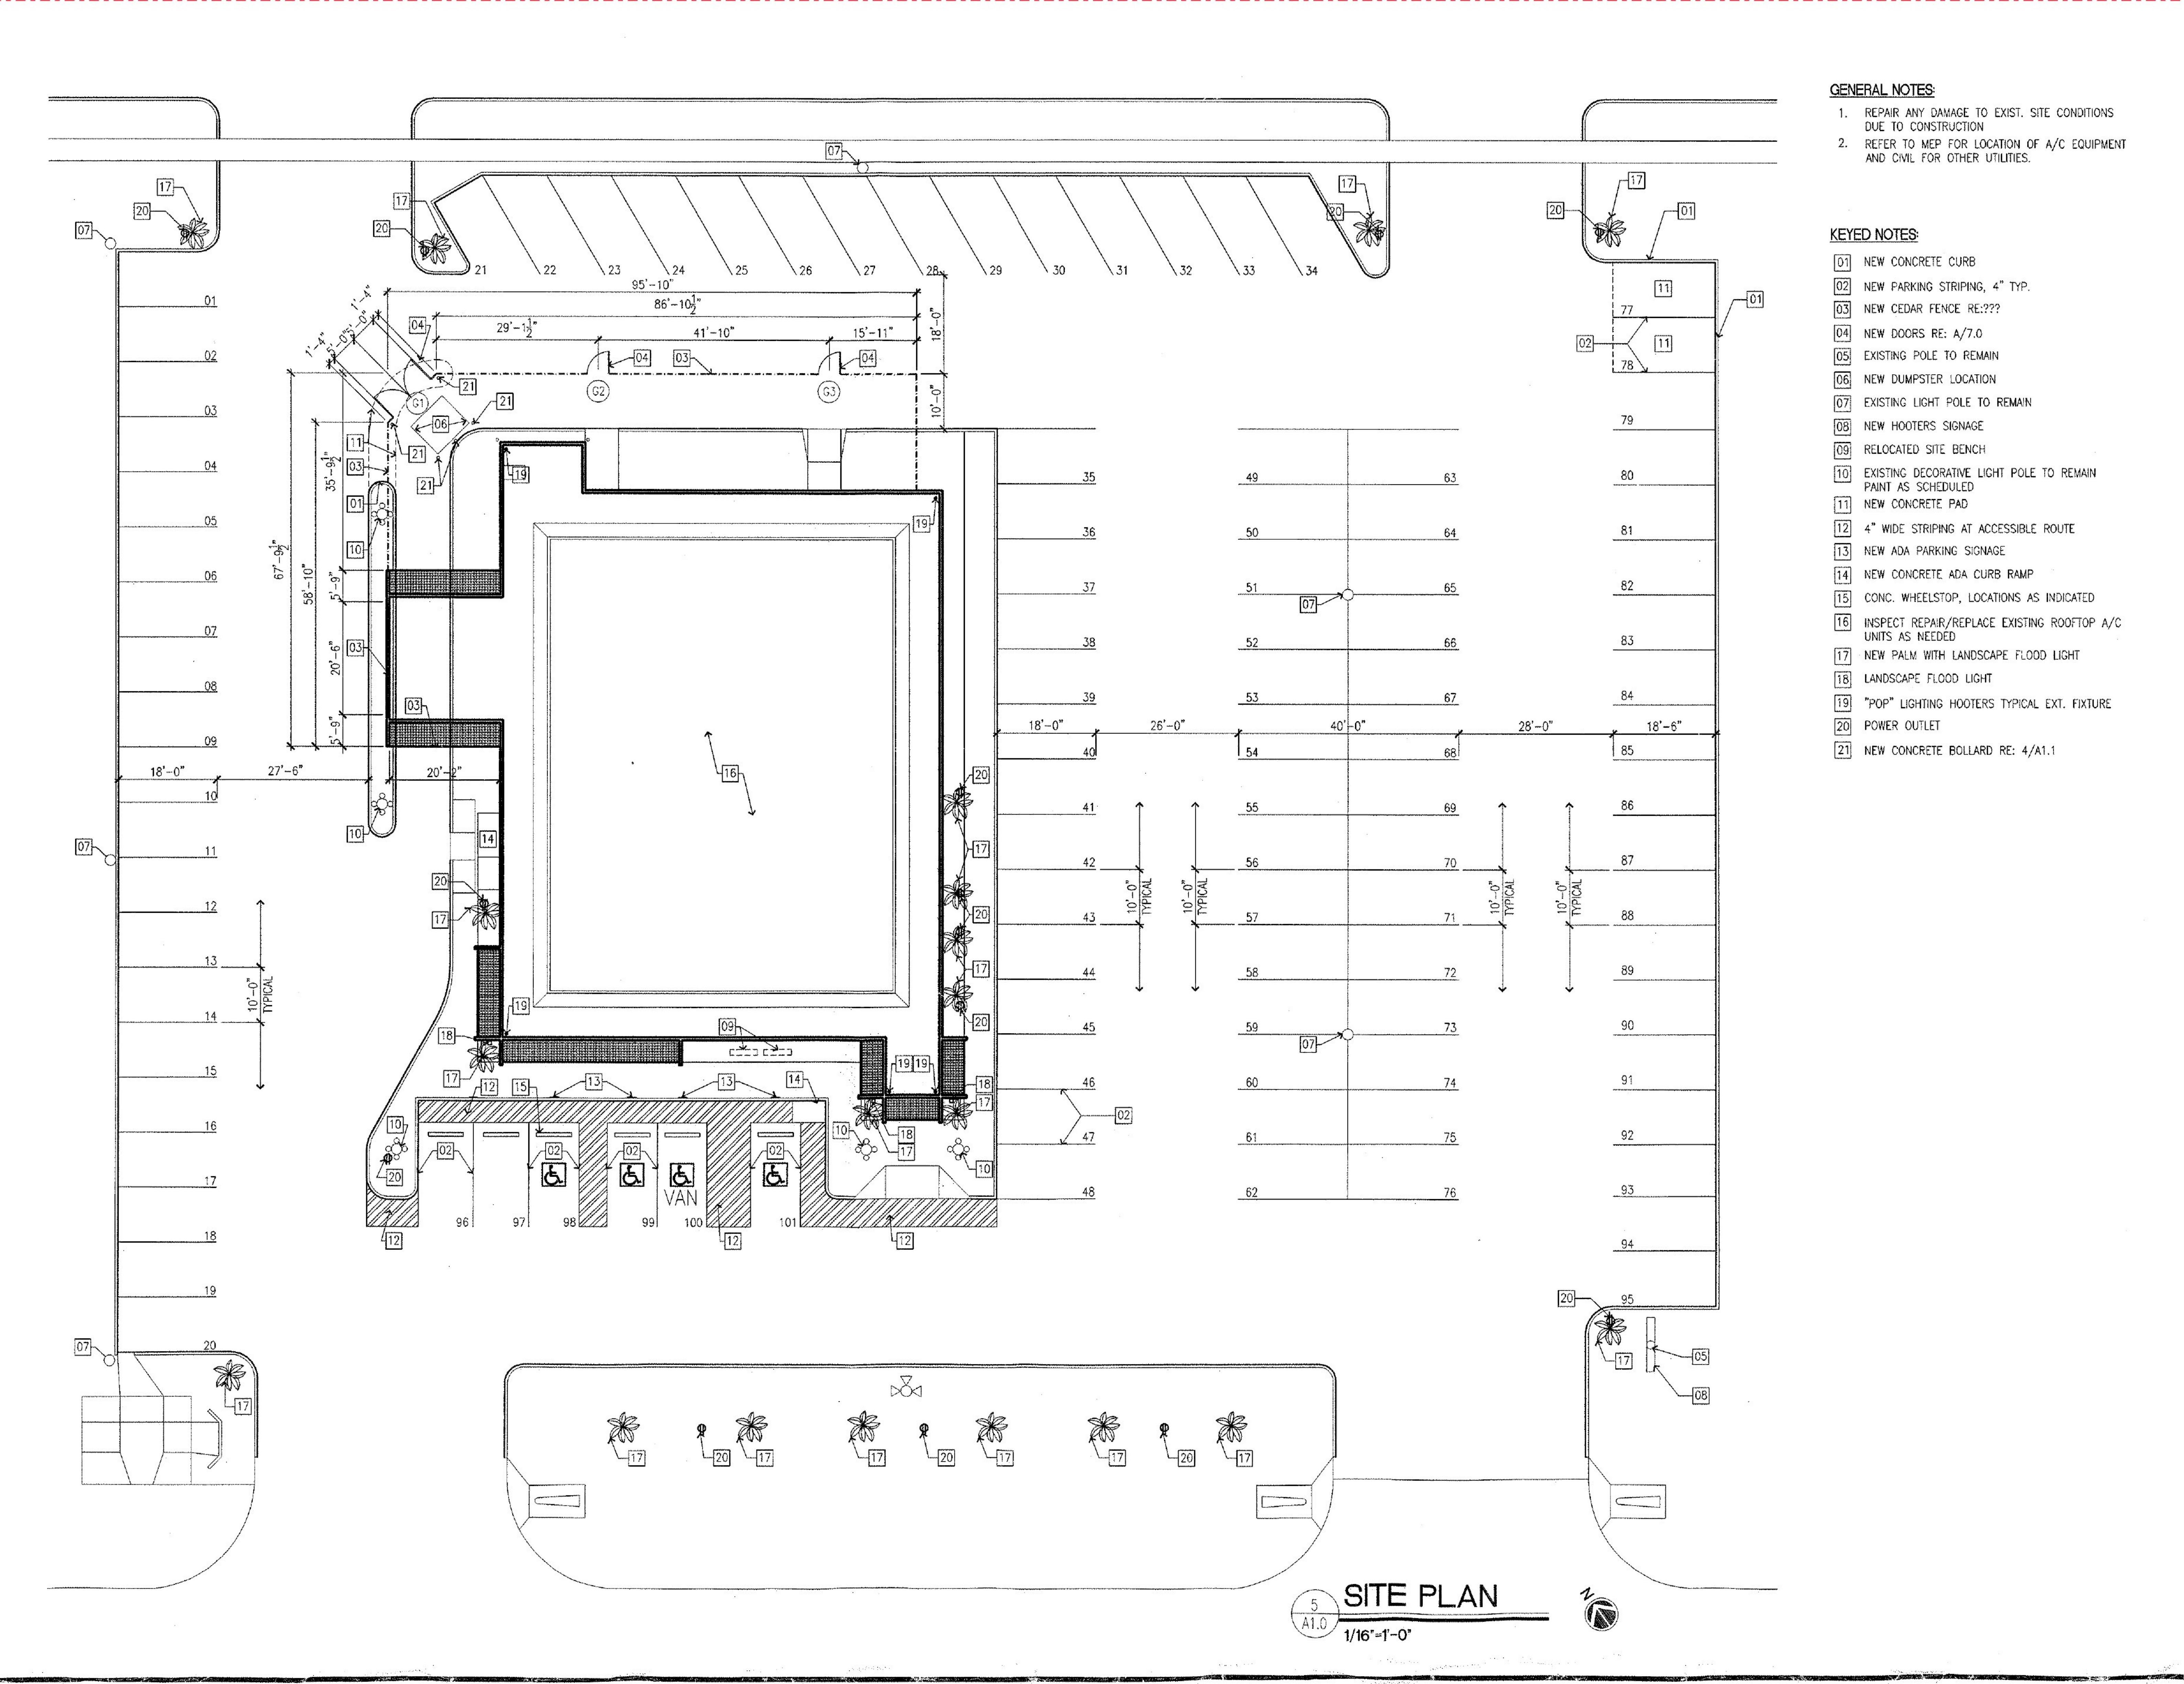 Freestanding Restaurant Bldg: site plan